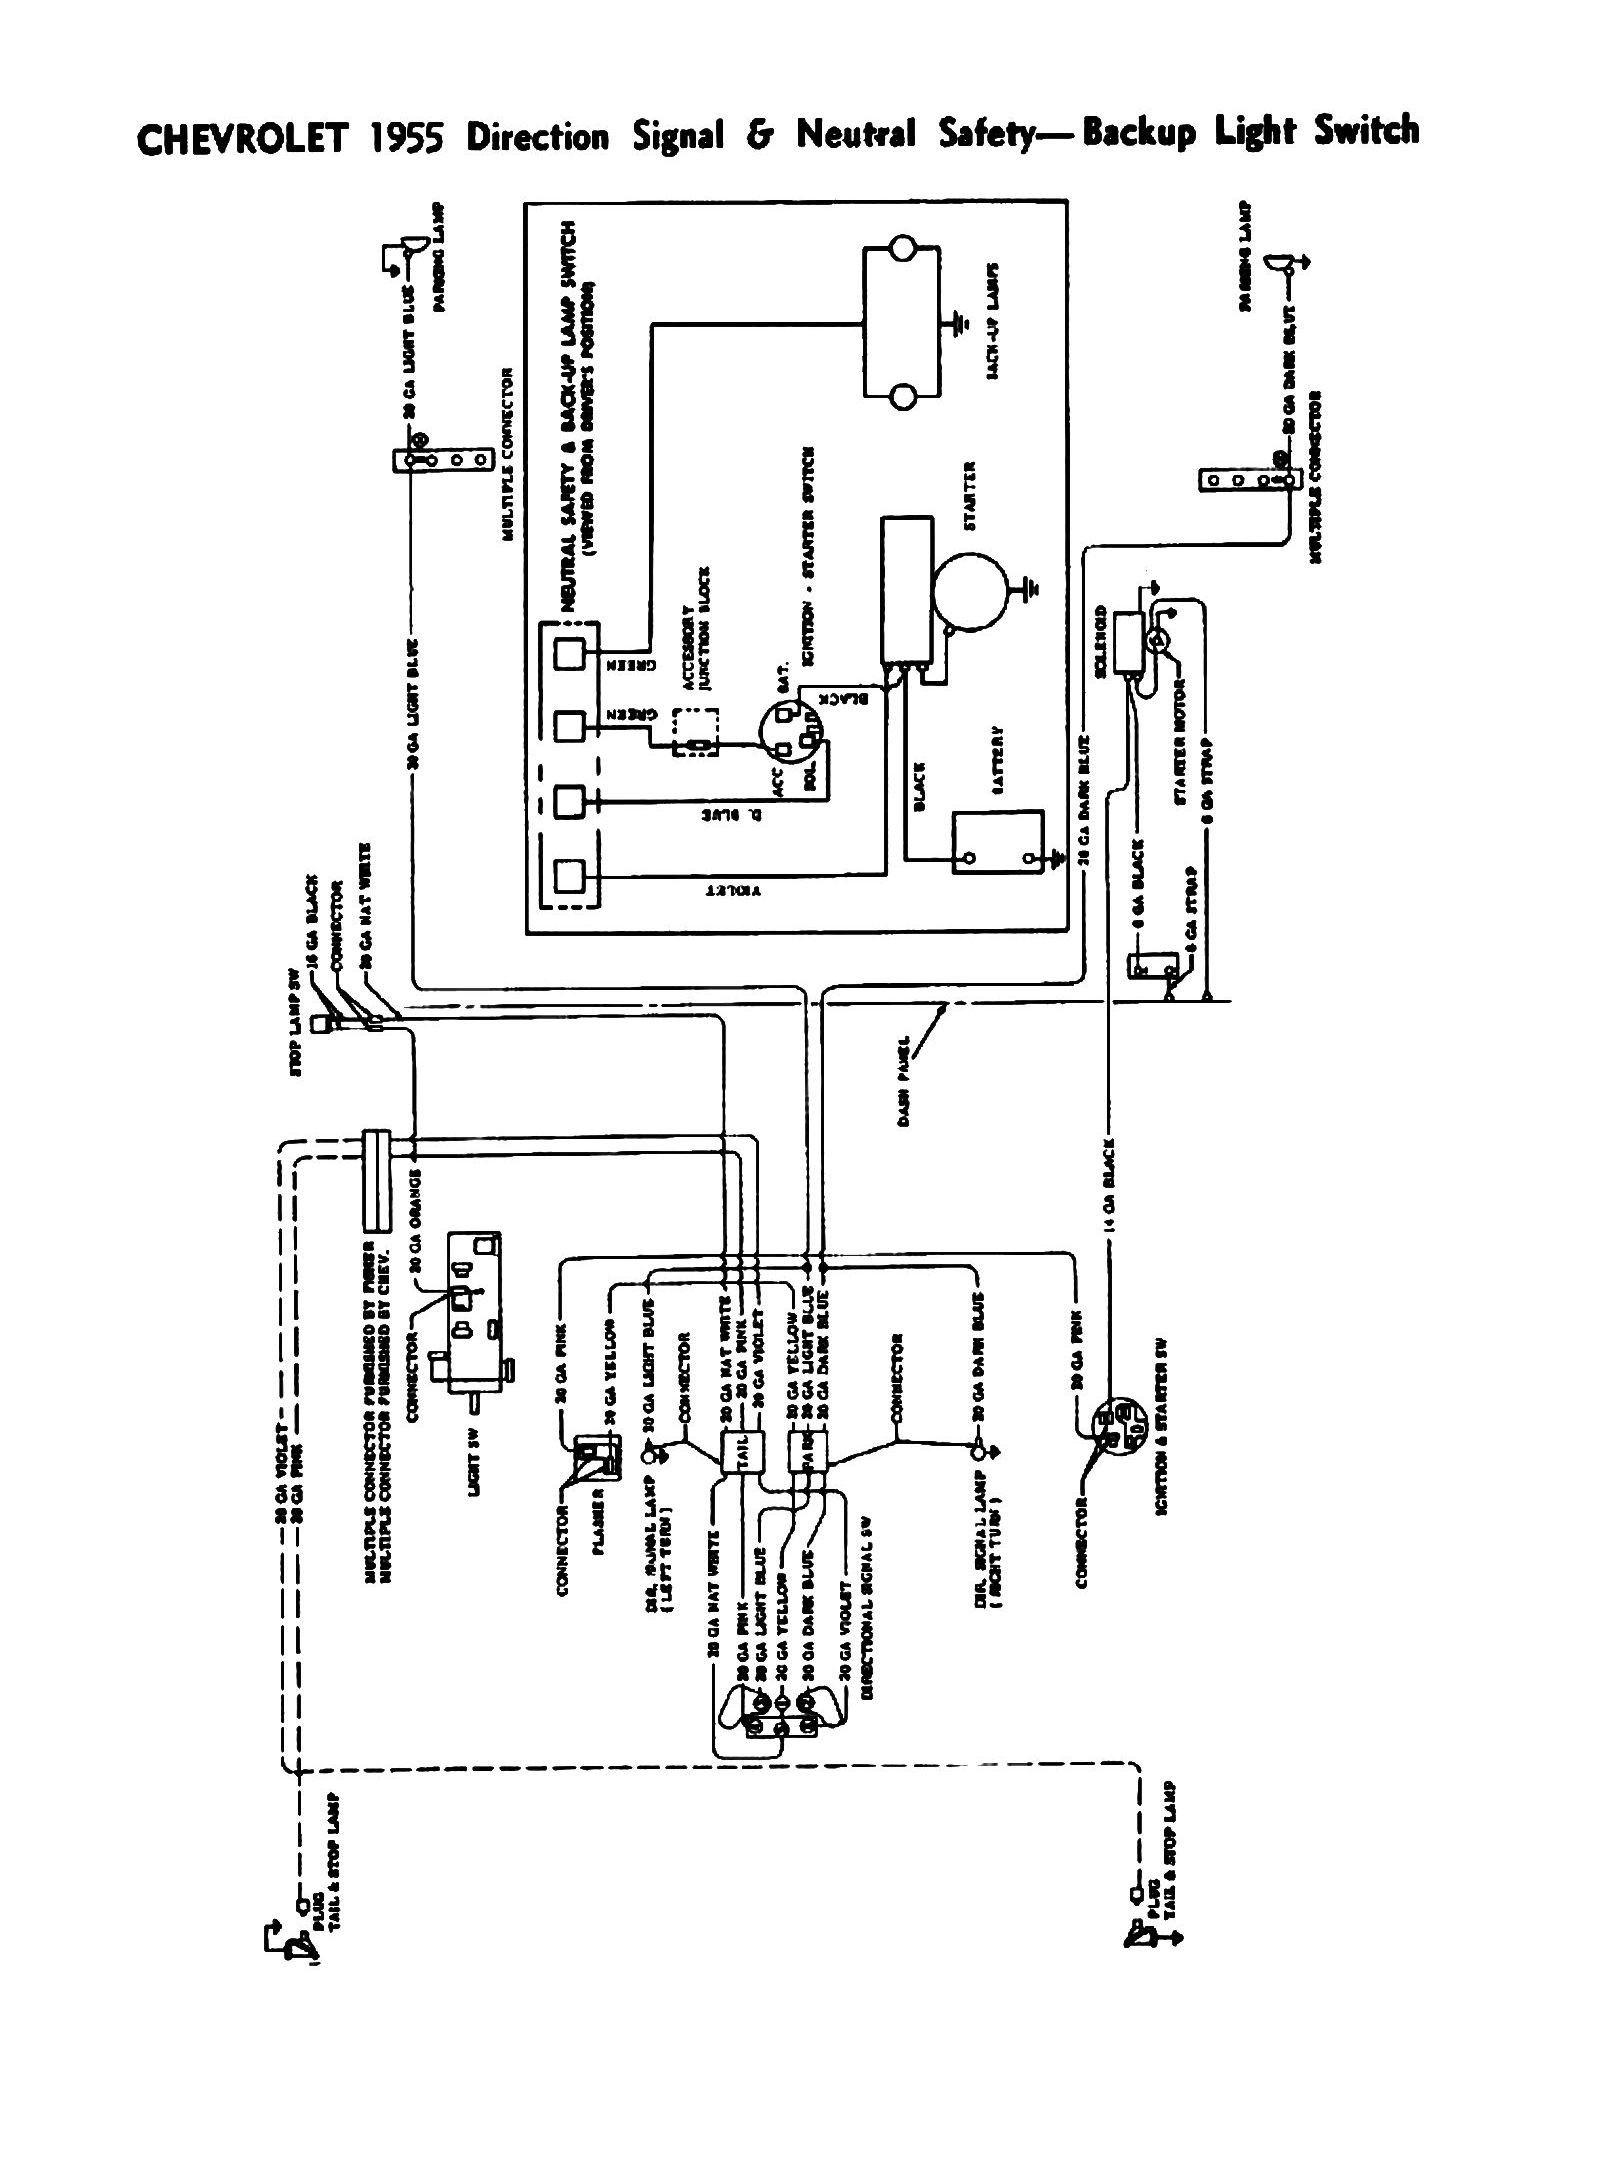 Printable Garmin Striker 4 Installation Instructions In 2021 Electrical Wiring Diagram Chevy Trucks Diagram